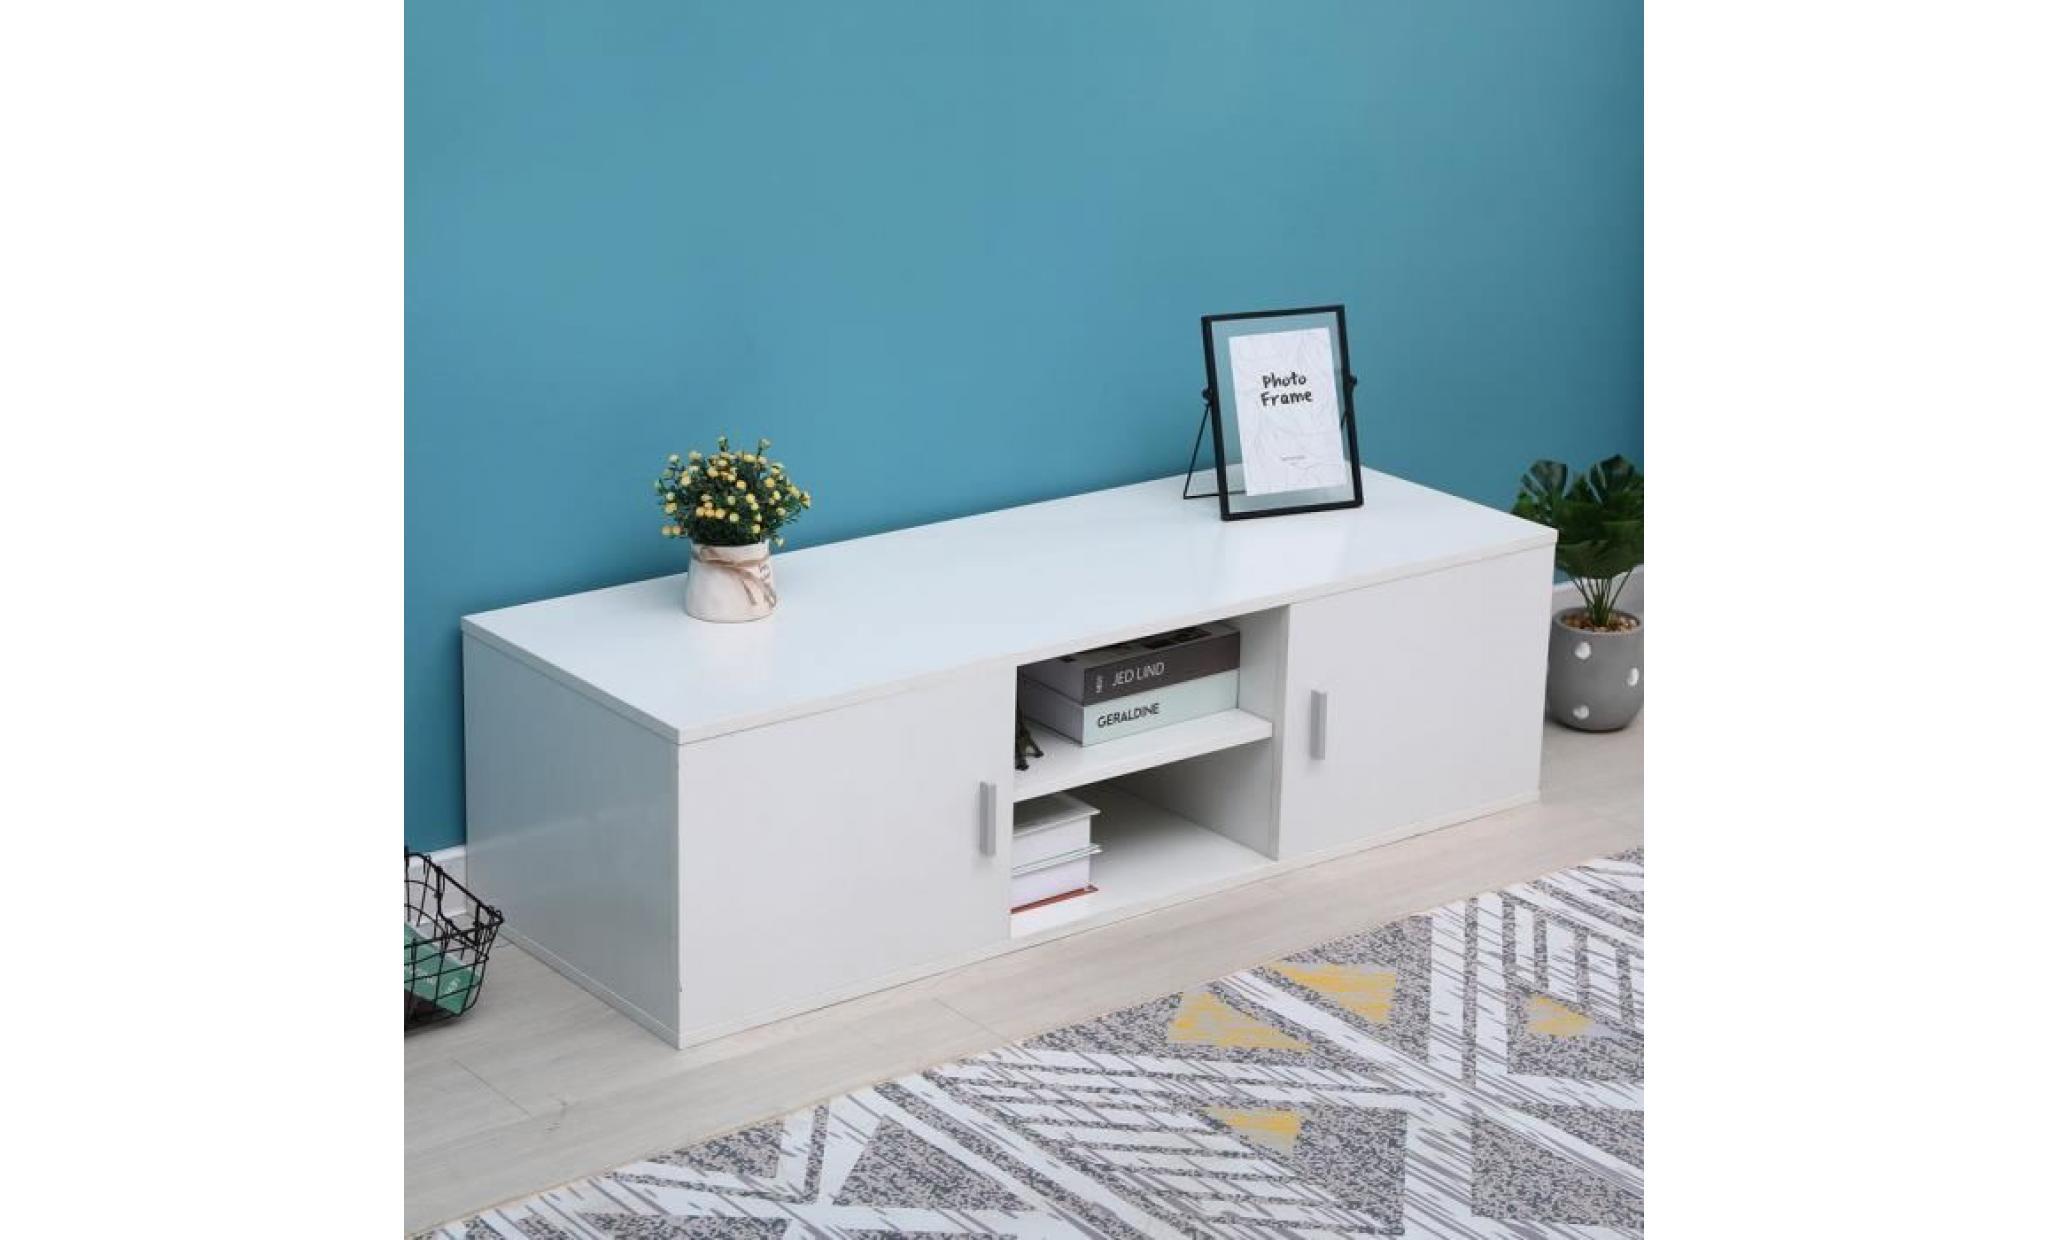 blanc meuble tv mdf 115 40 34cm scandinave meuble hifi home cinema meuble achat vente meuble tv pas cher couleur et design fr